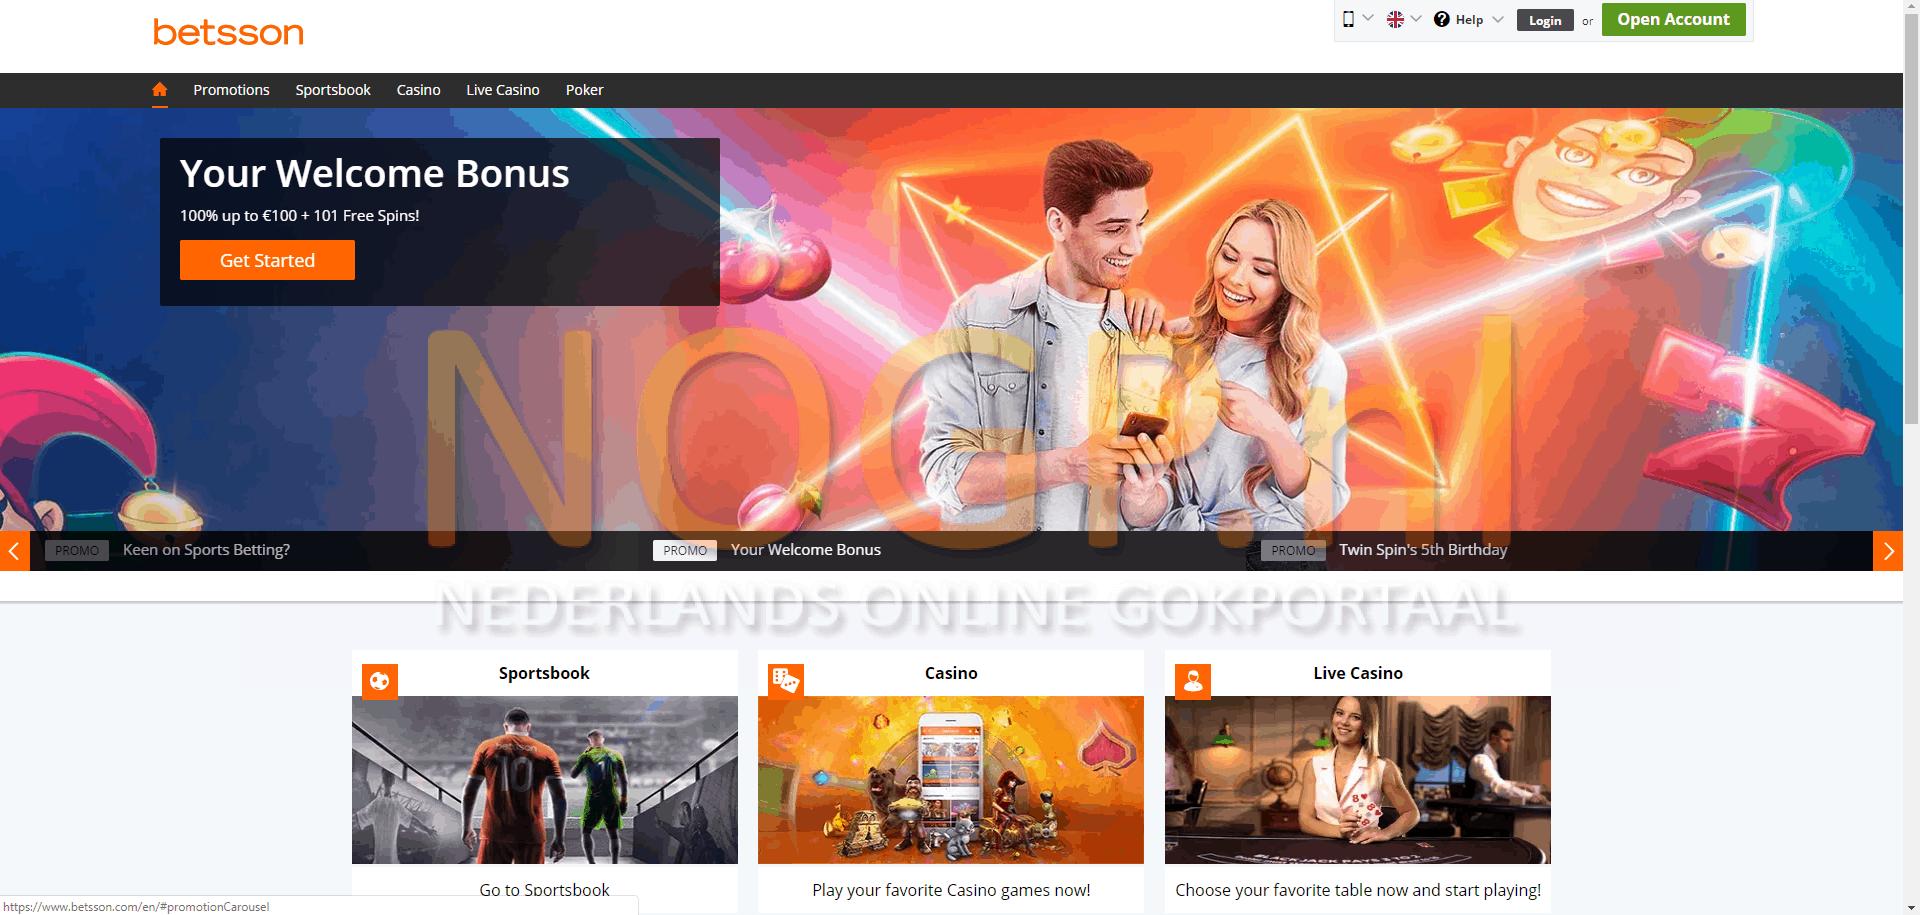 nederlandse online casinos no deposit bonus